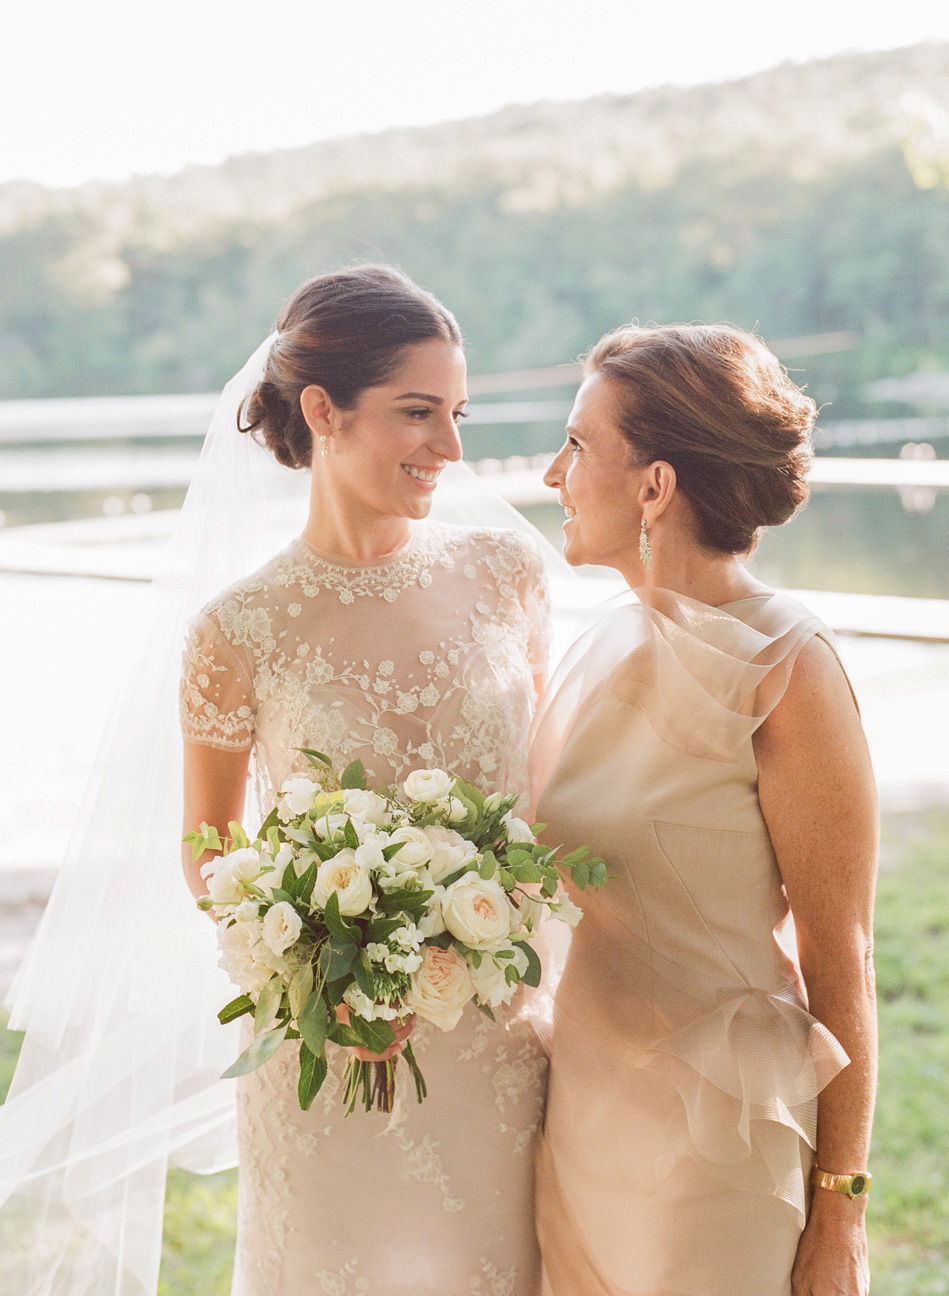 KarenHillPhotography-Parizat-Wedding-0344.jpg